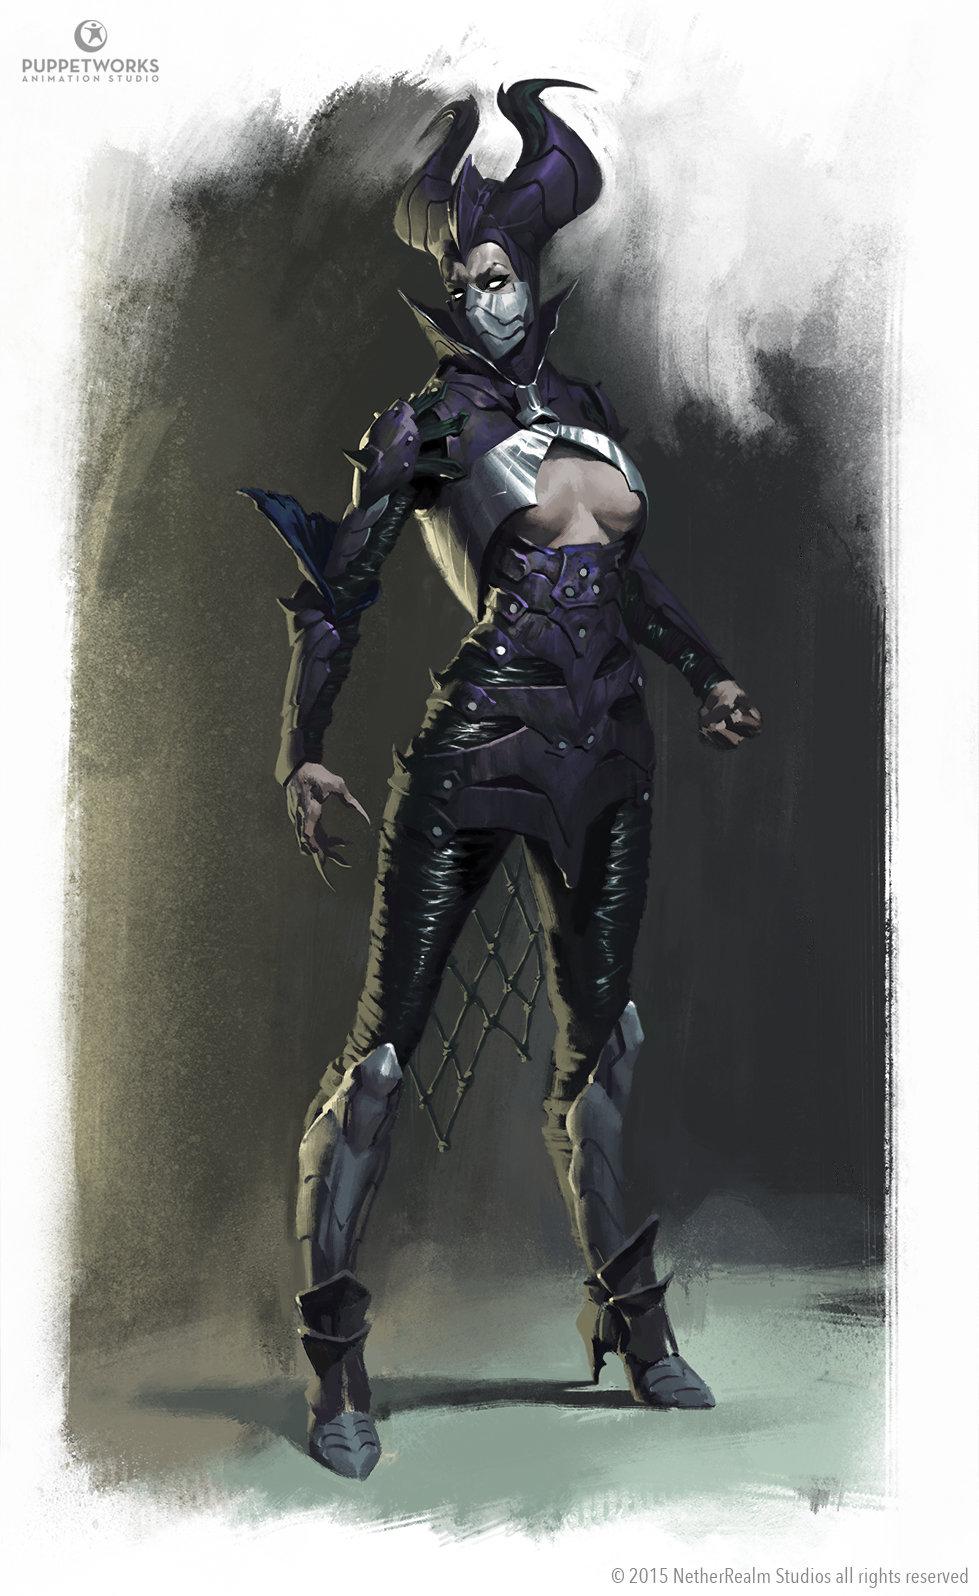 Mortal Kombat Raiden Drawings The gruesomely beautif...